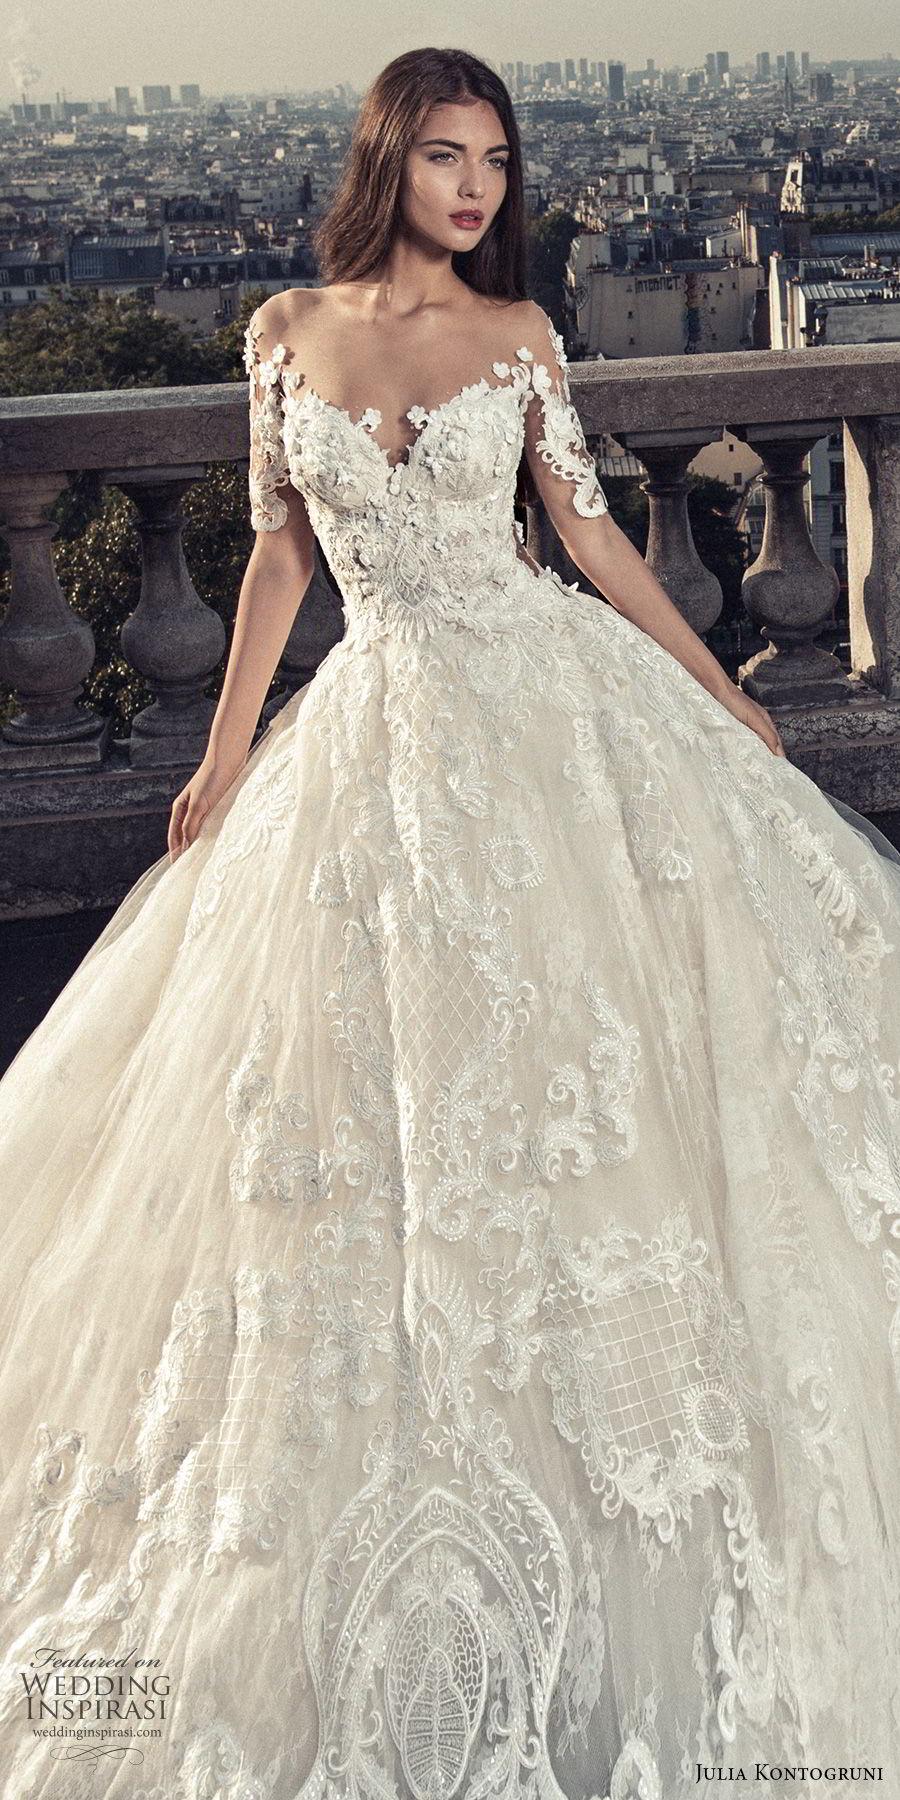 julia kontogruni 2018 bridal half sleeves off shoulder sweetheart neckline full embellishment princess ball gown wedding dress sheer lace back royal train (1) zv